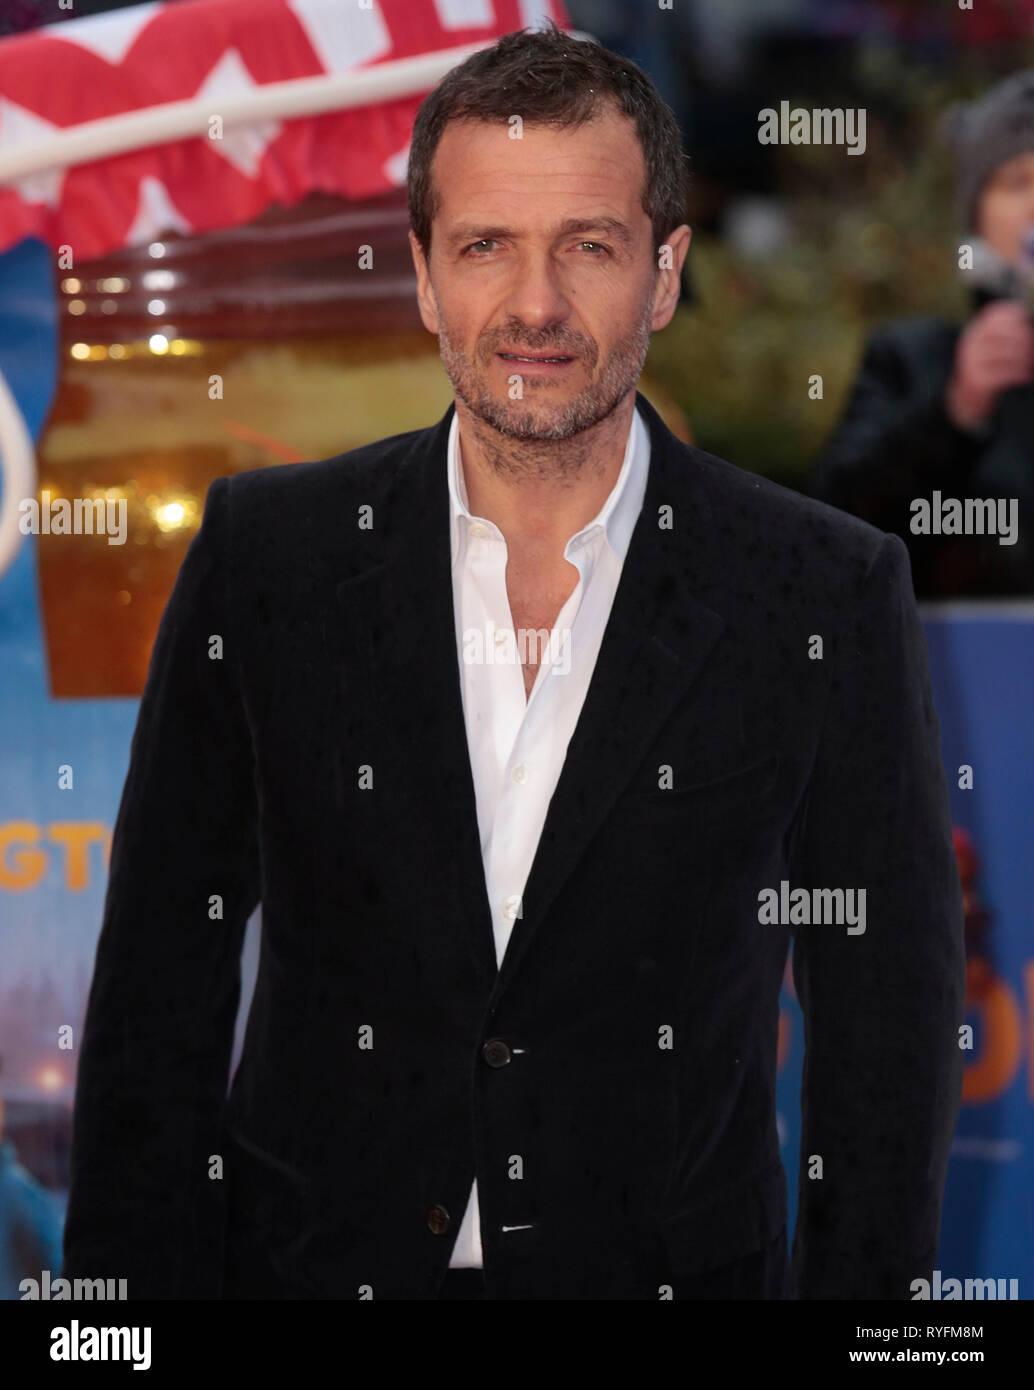 Nov 23, 2014 - London, England, UK - 'Paddington' World Premiere - Red Carpet Arrivals, Odeon, Leicester Square Photo Shows: David Heyman - Stock Image